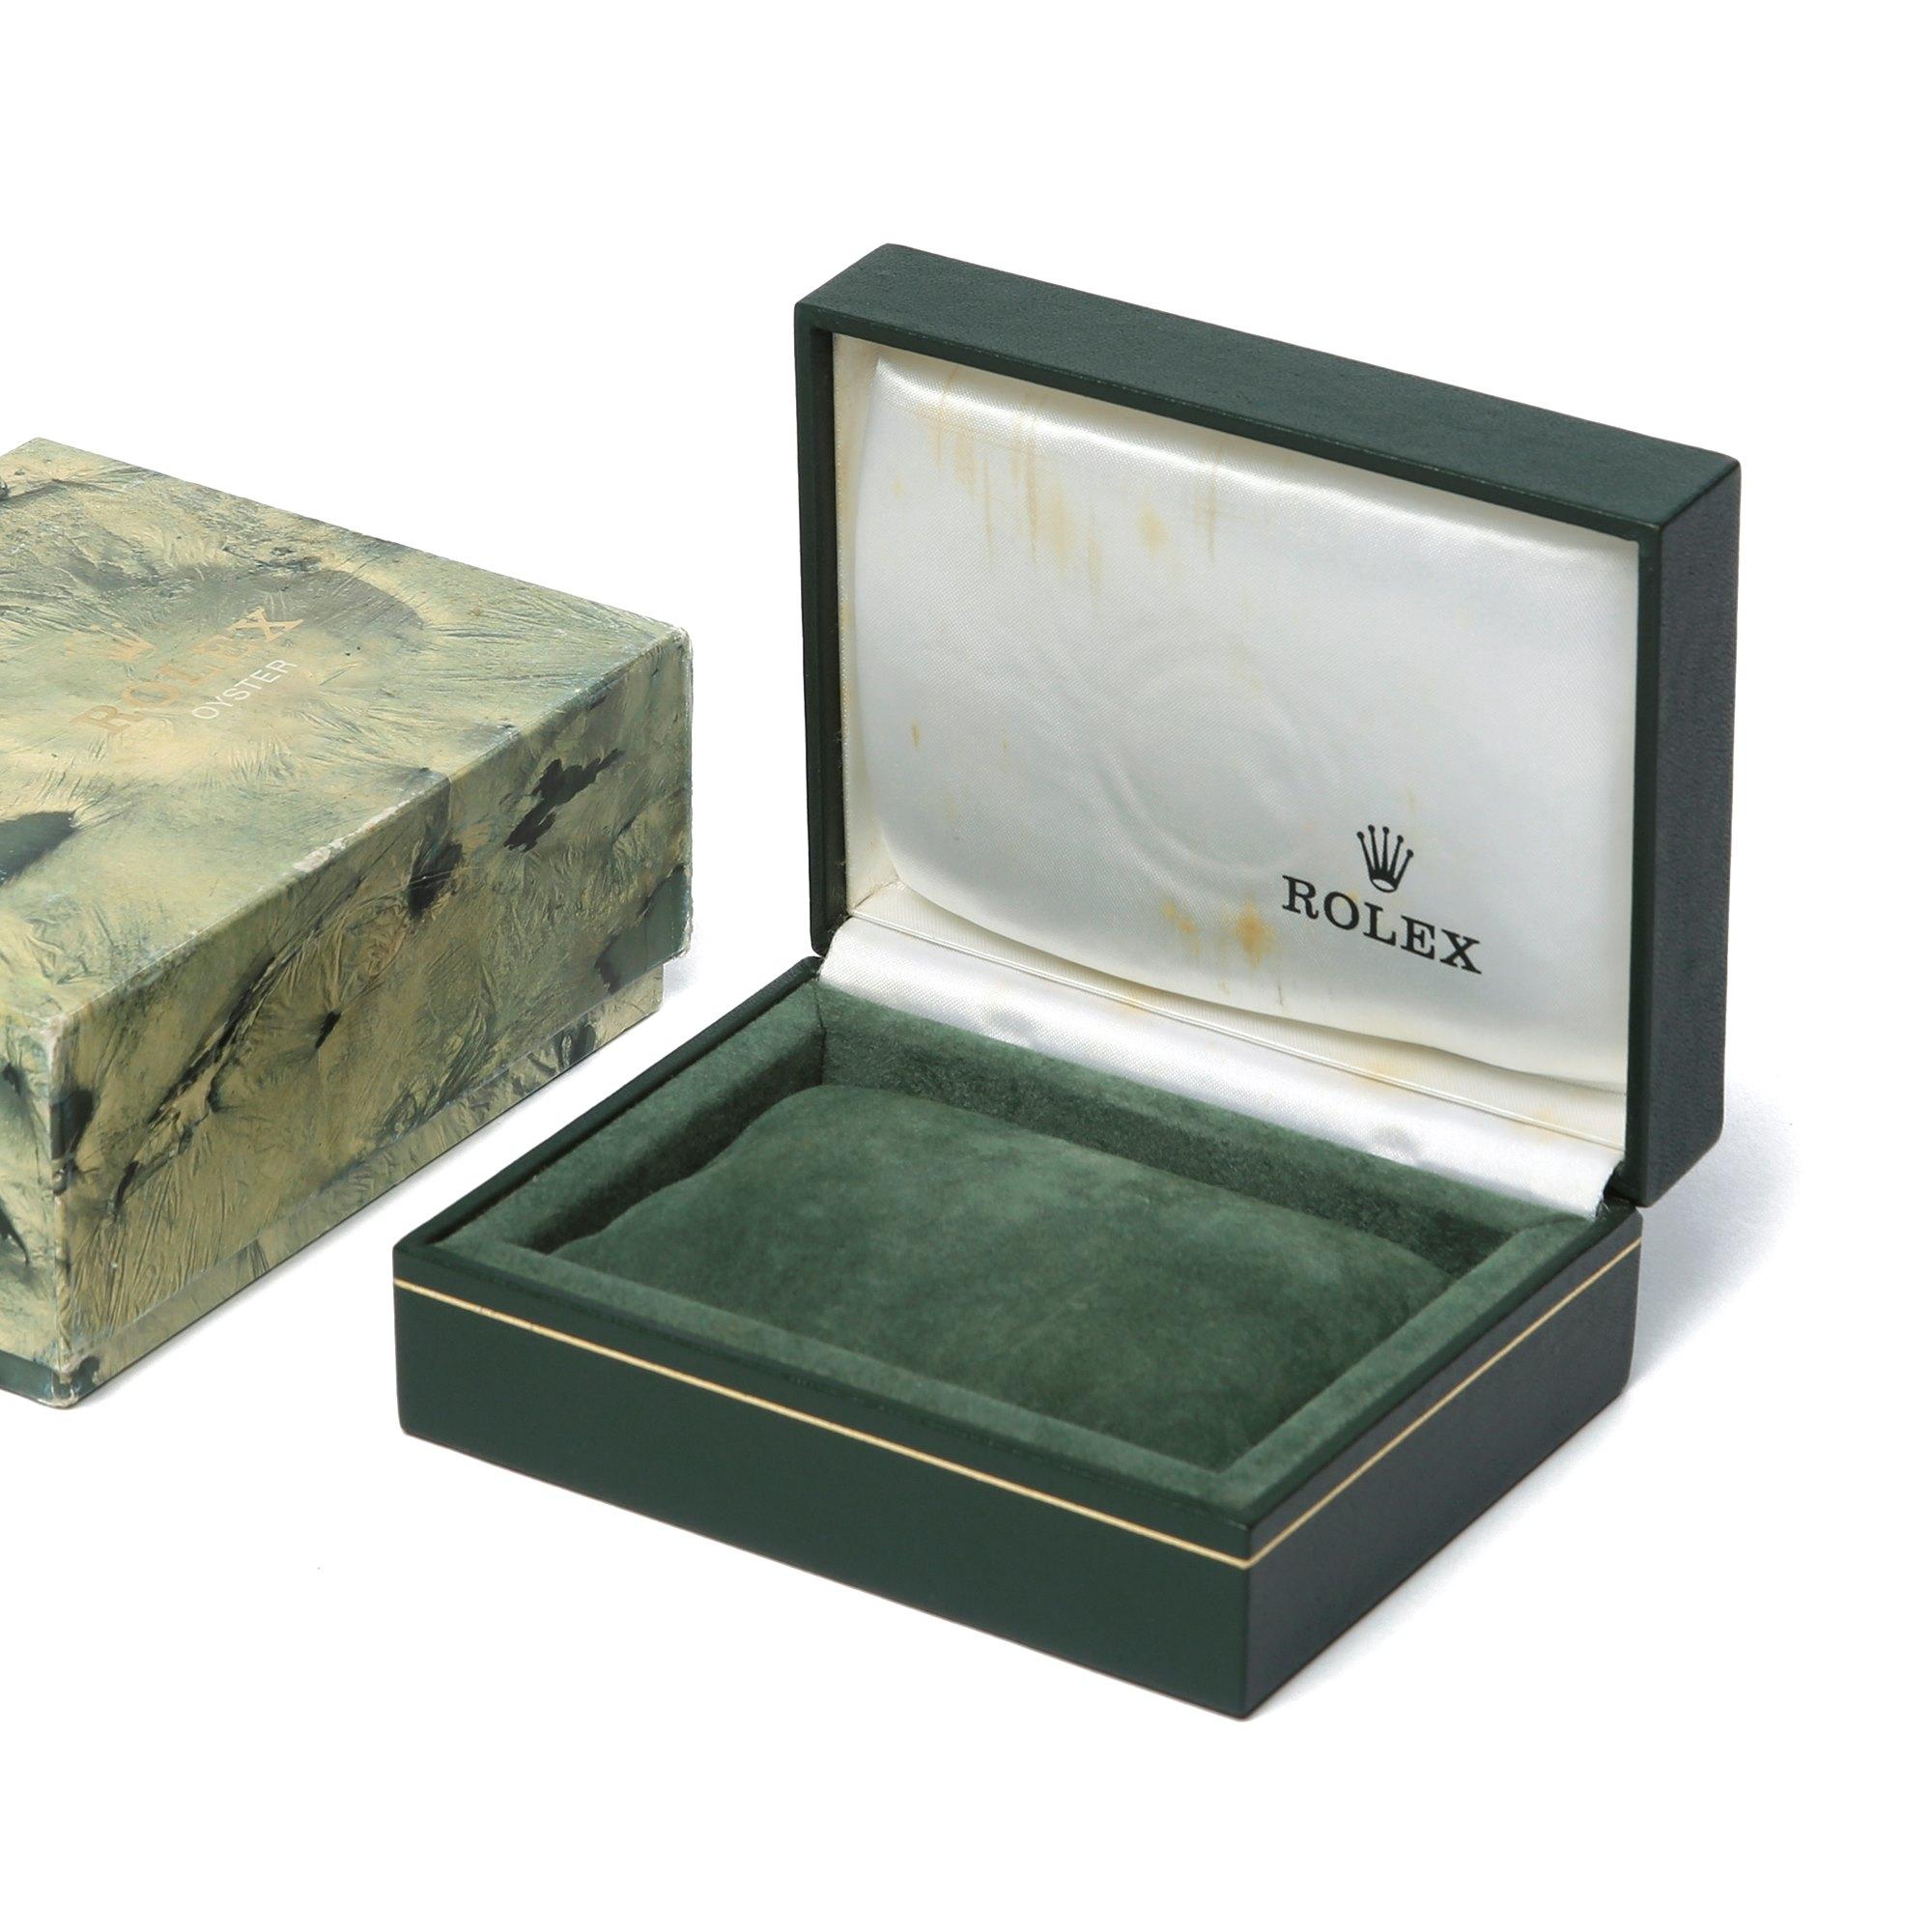 Rolex Datejust 26 18K White Gold & Stainless Steel 69174